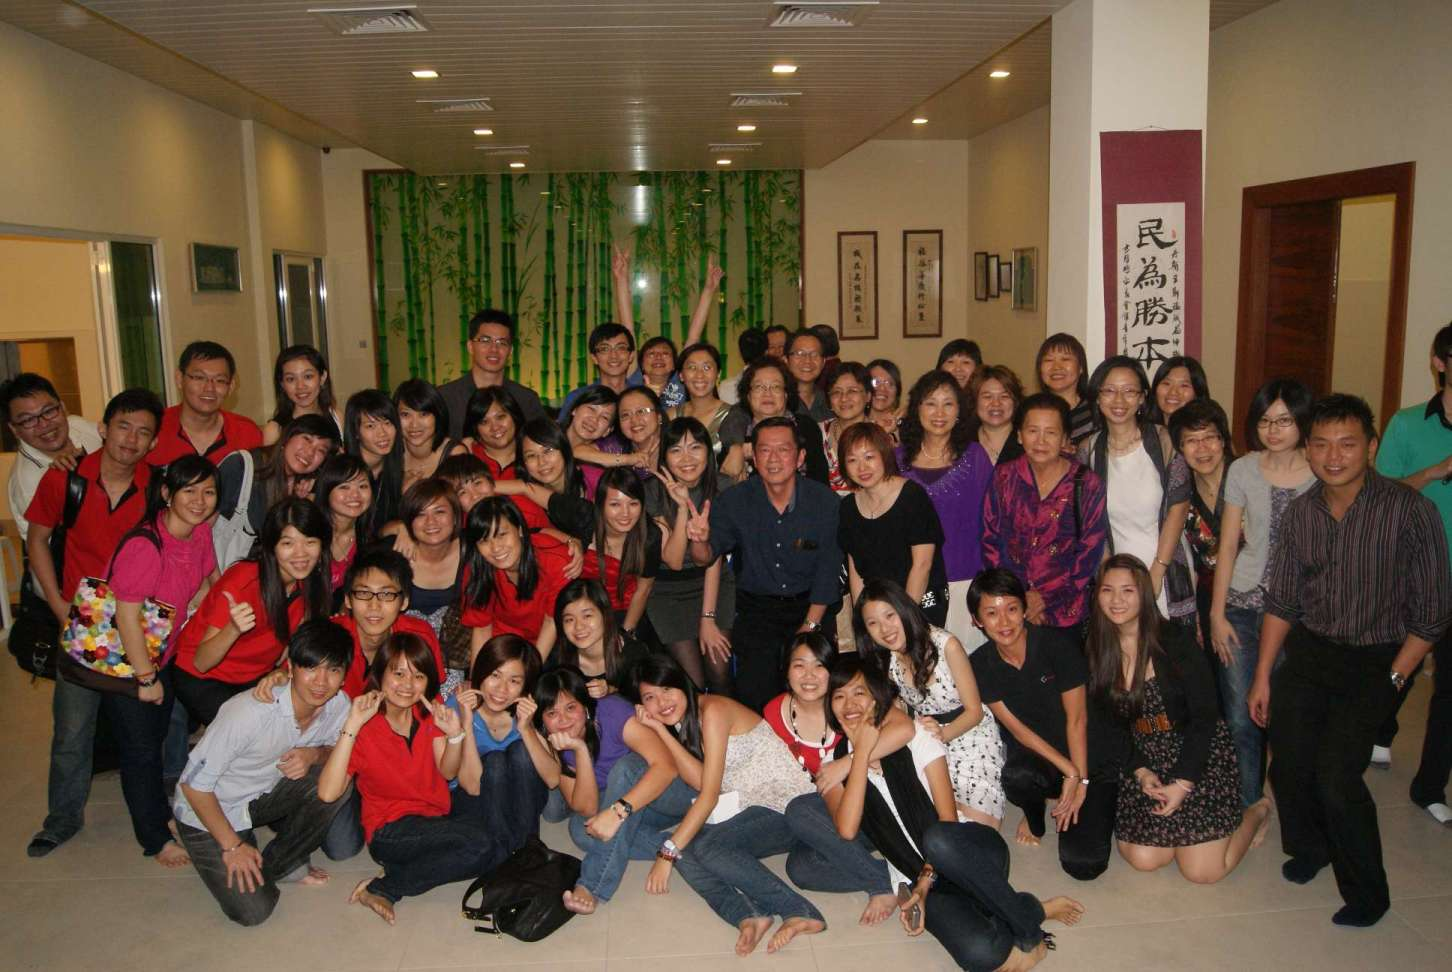 YYC Annual Dinner 2010